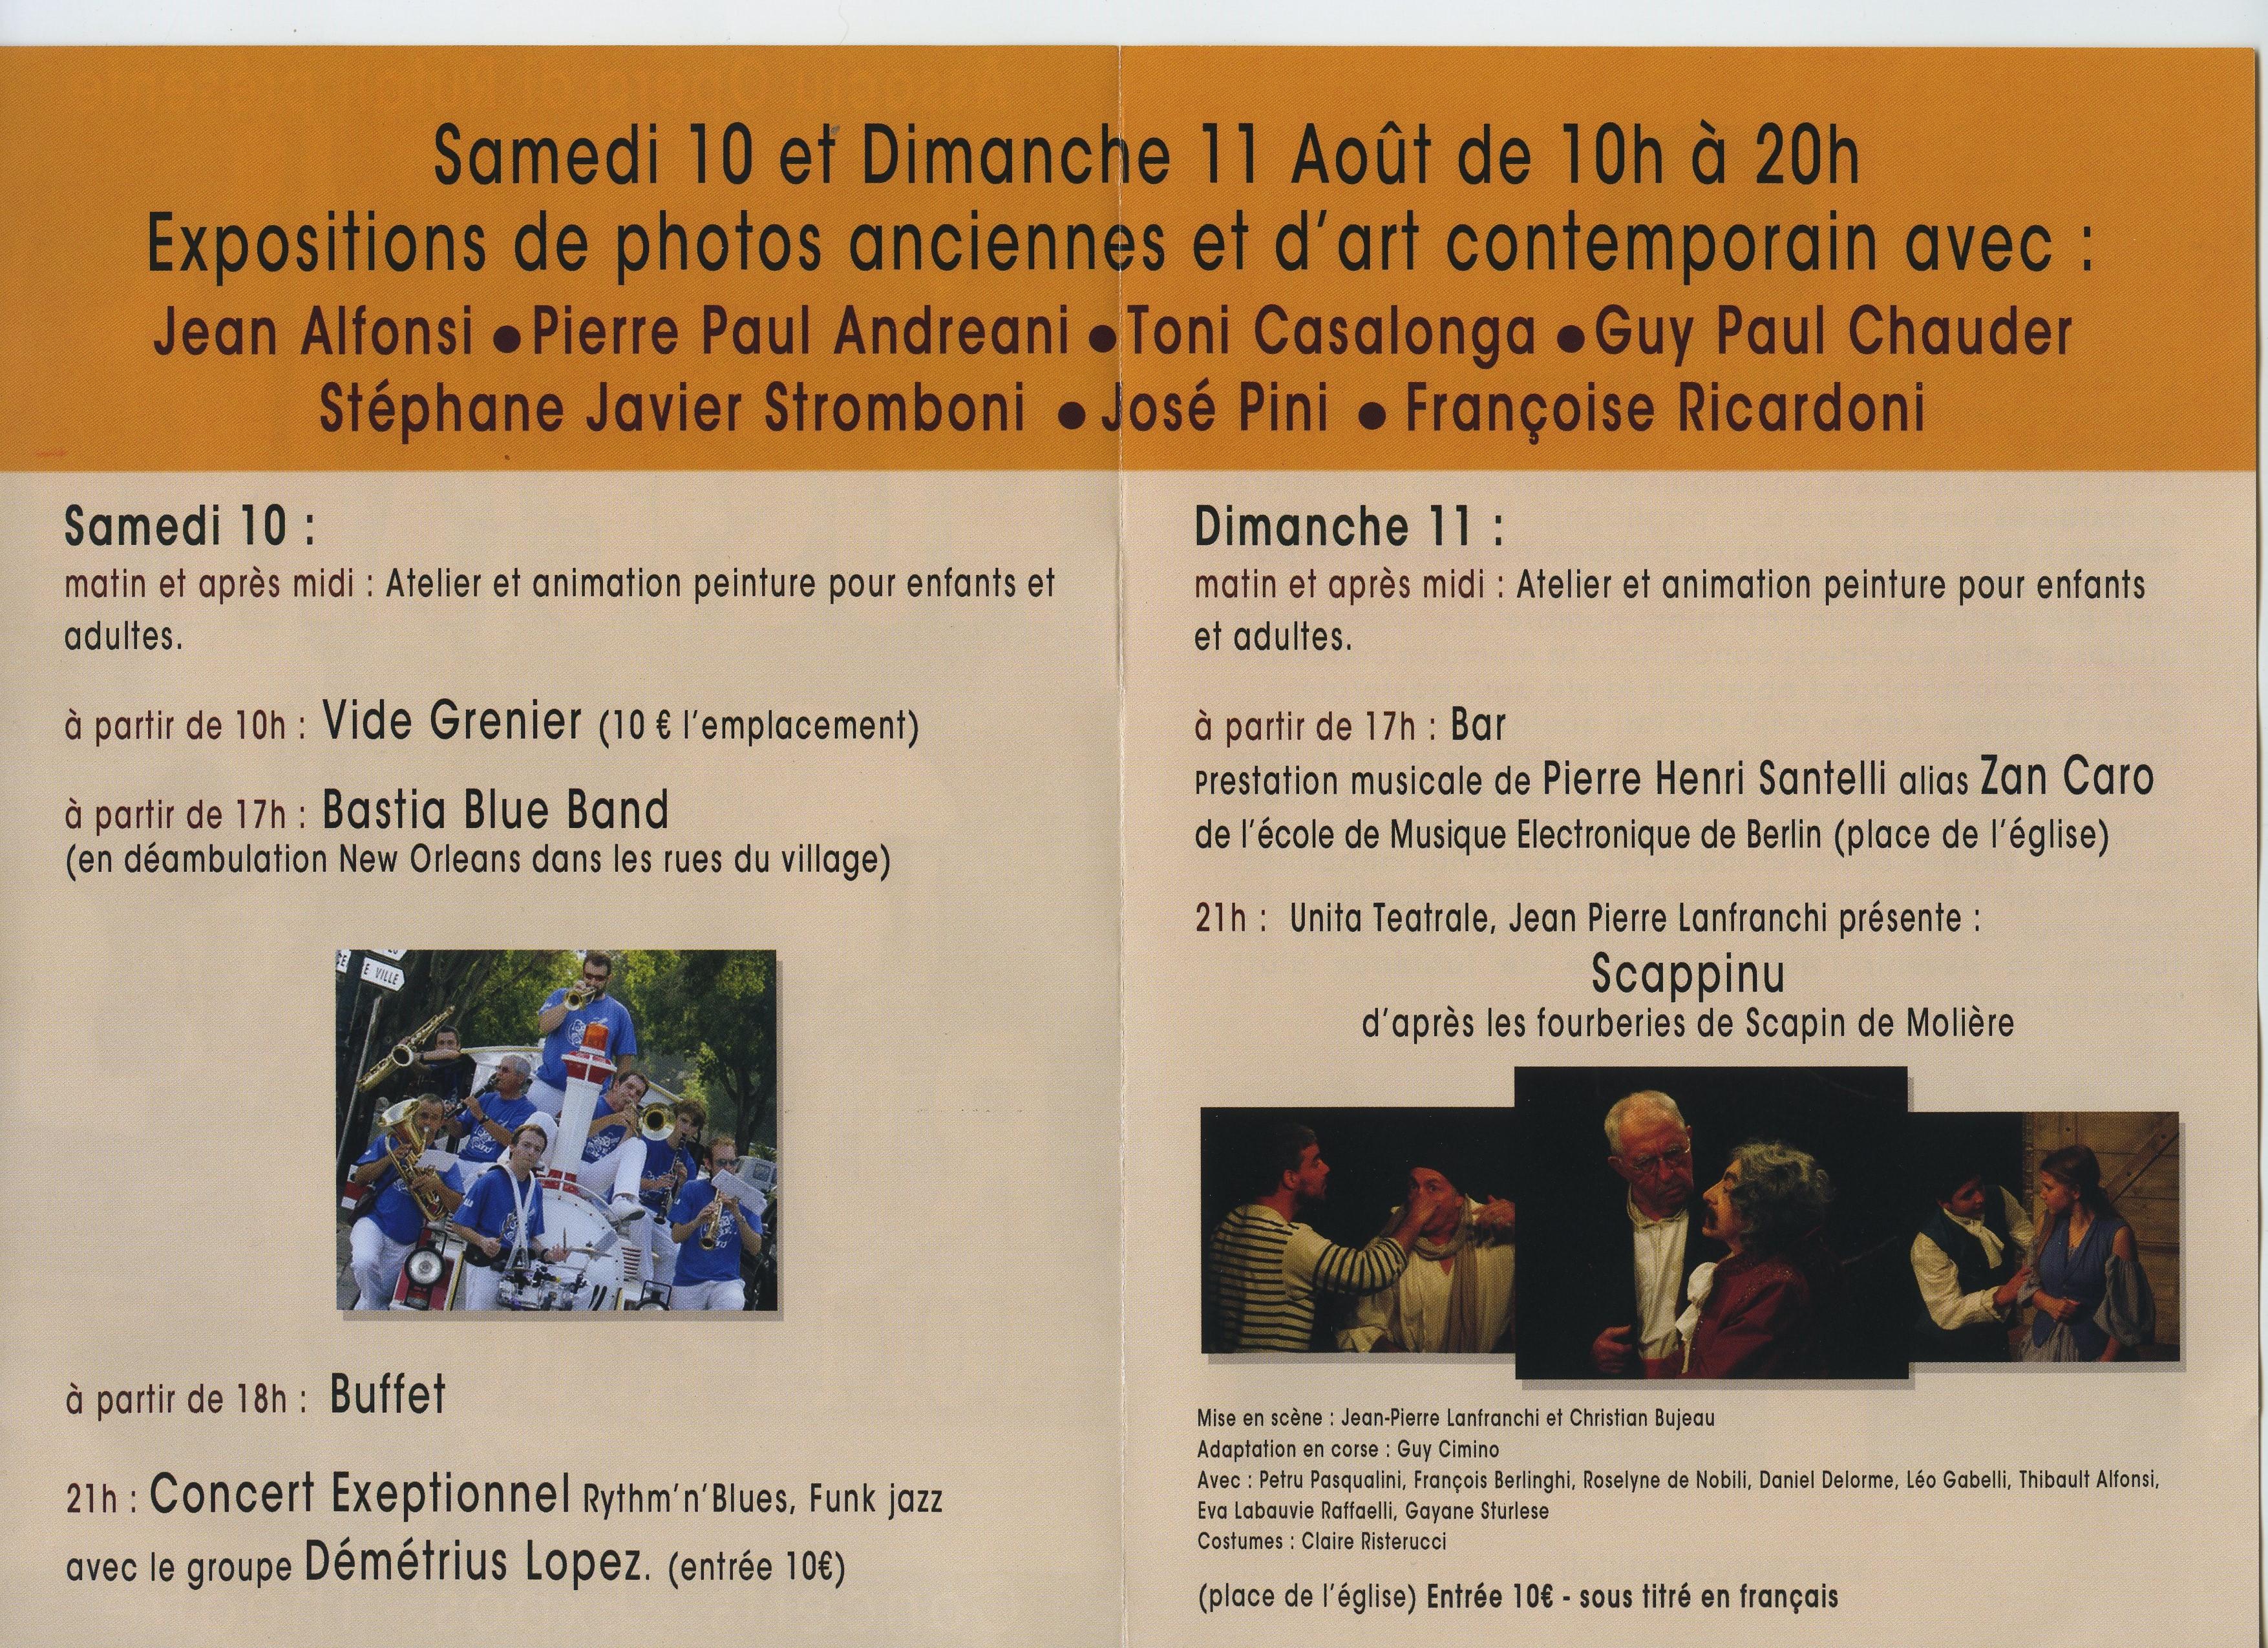 Music'Arte in Rutali les 10 et 11 Août prochains